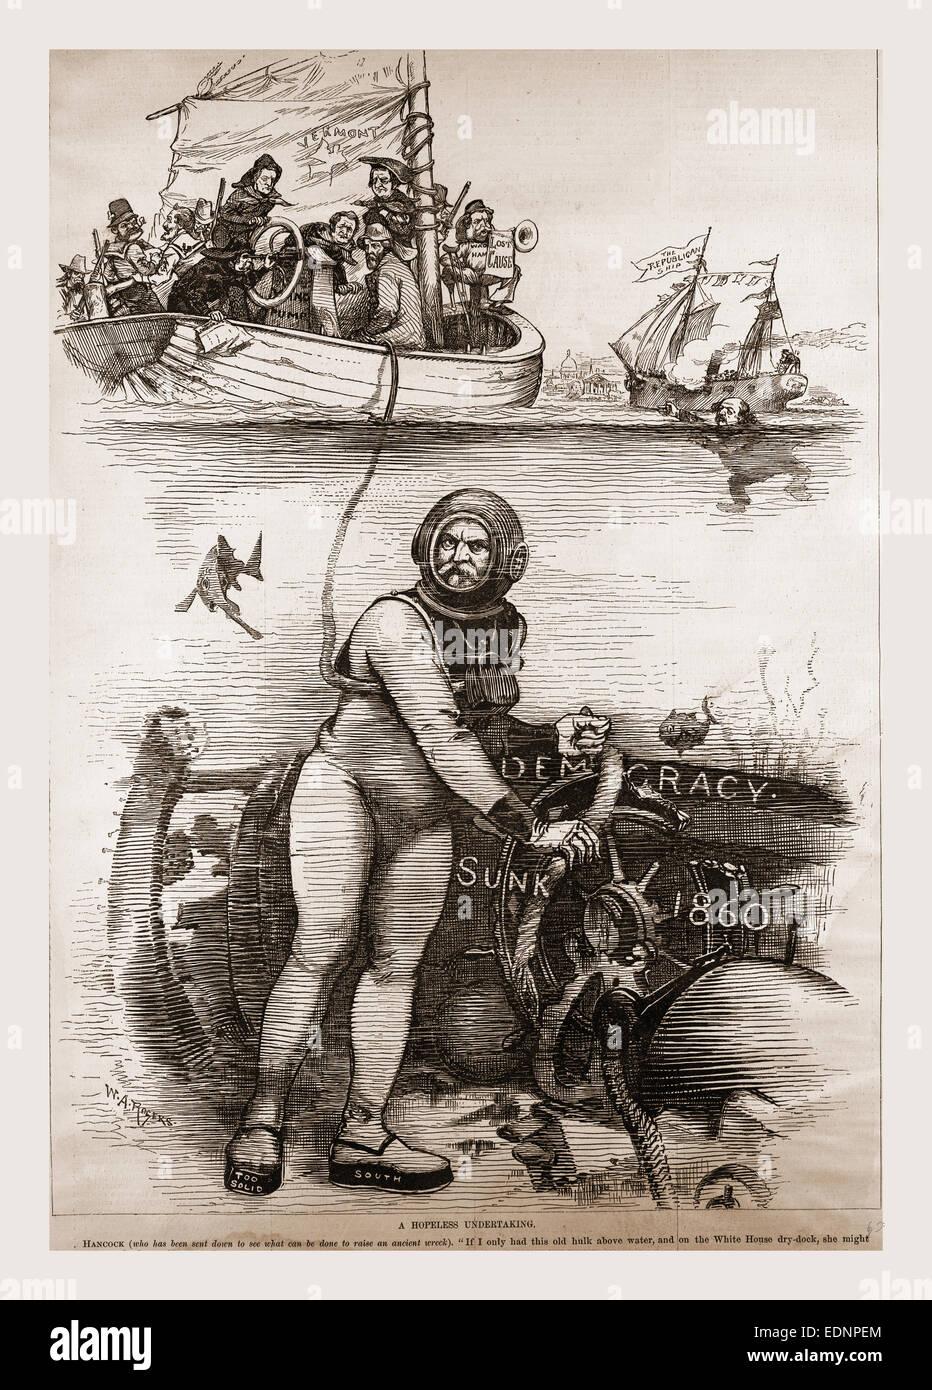 Democracy sunk 1860, 19th century engraving, USA, America - Stock Image